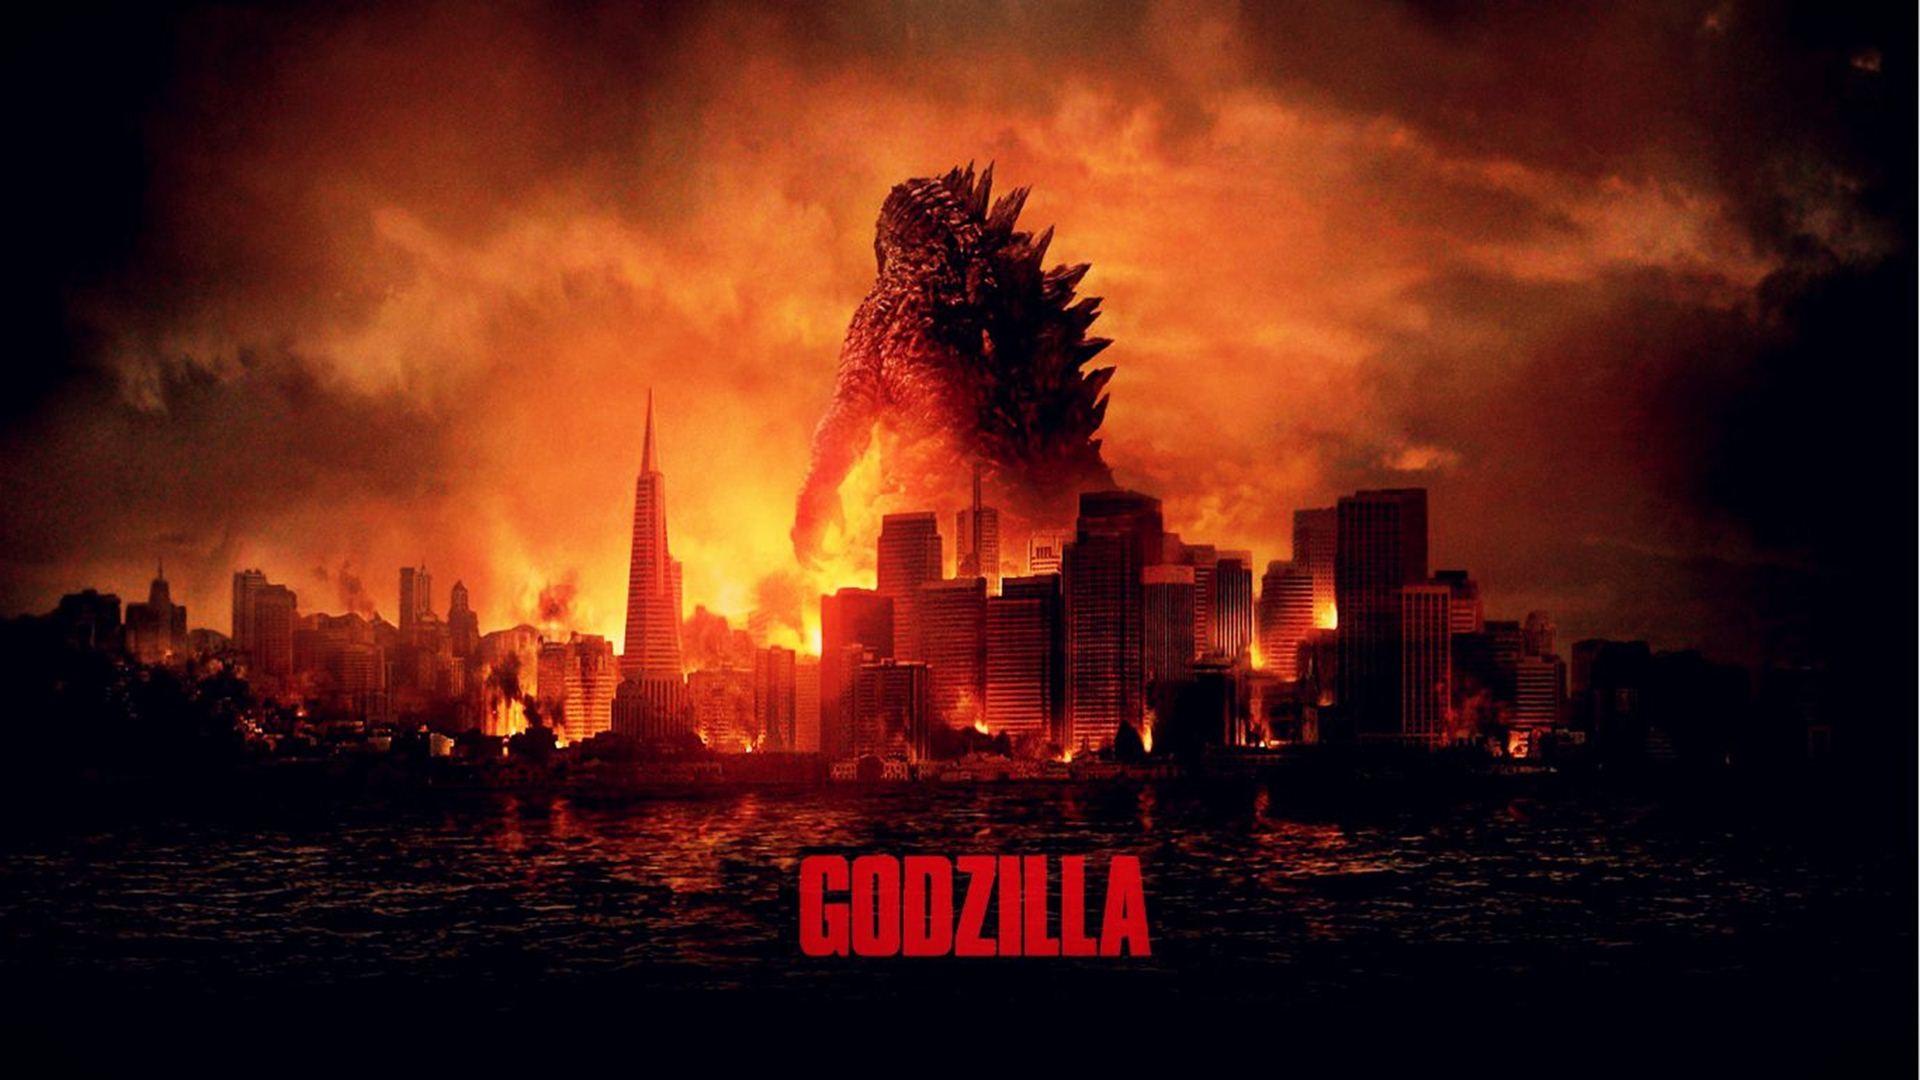 Godzilla Wallpapers Wallpaper